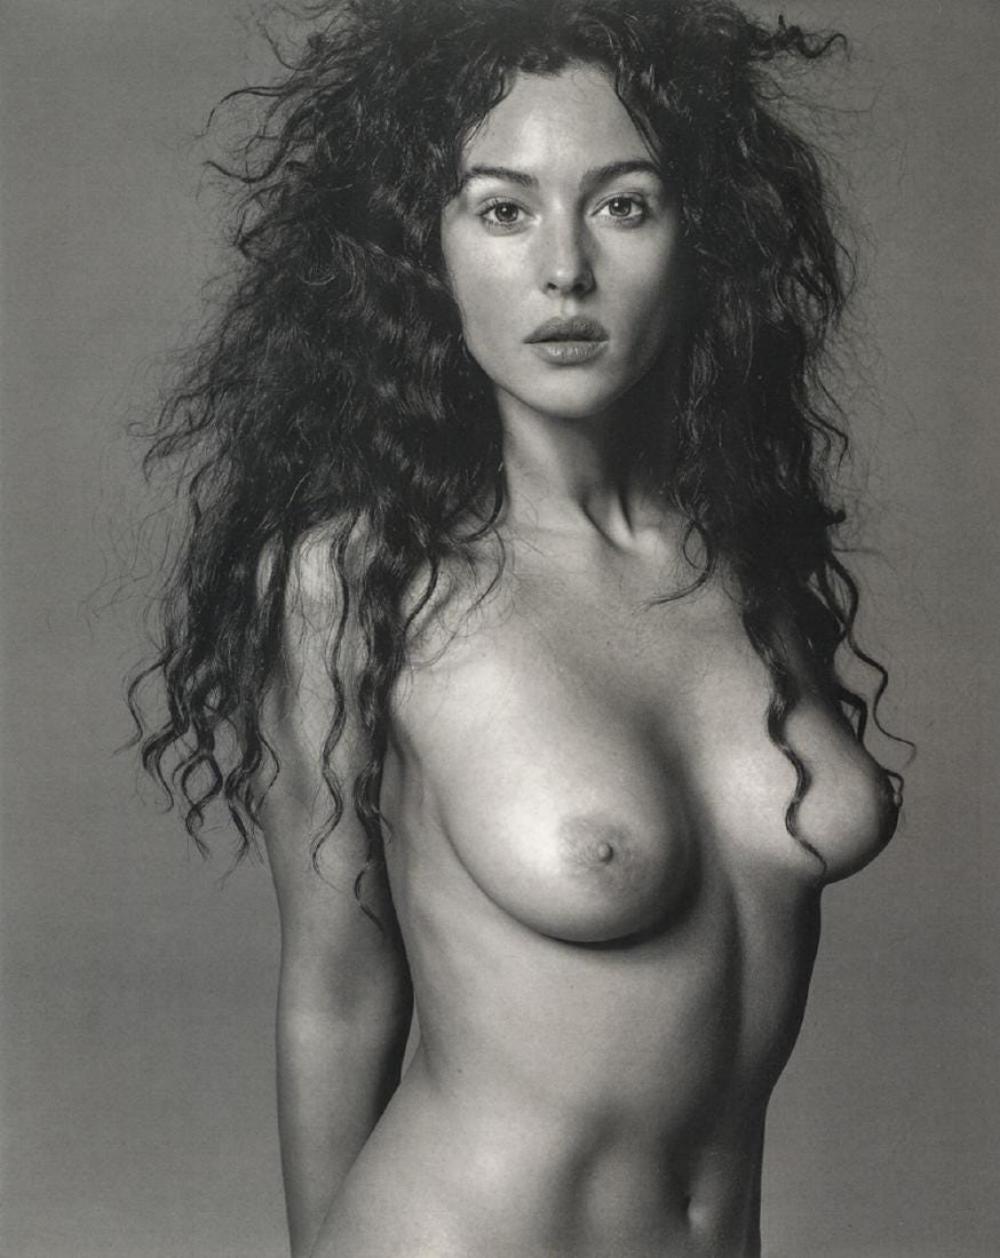 RICHARD AVEDON - MONICA BELLUCCI, 1992